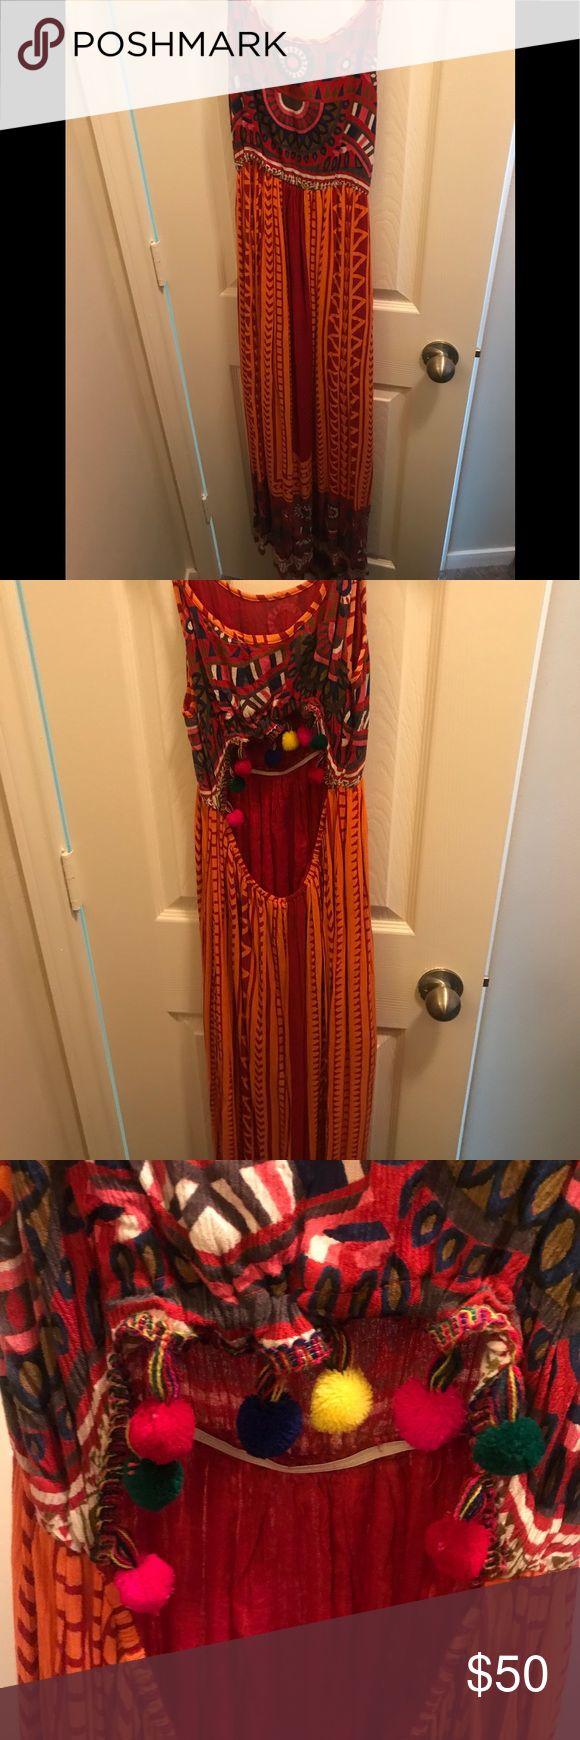 Chelsea & Violet Maxi Pom Pom Dress Beautiful Dress. NWT. Open back with Pom Pom detail Chelsea & Violet Dresses Maxi